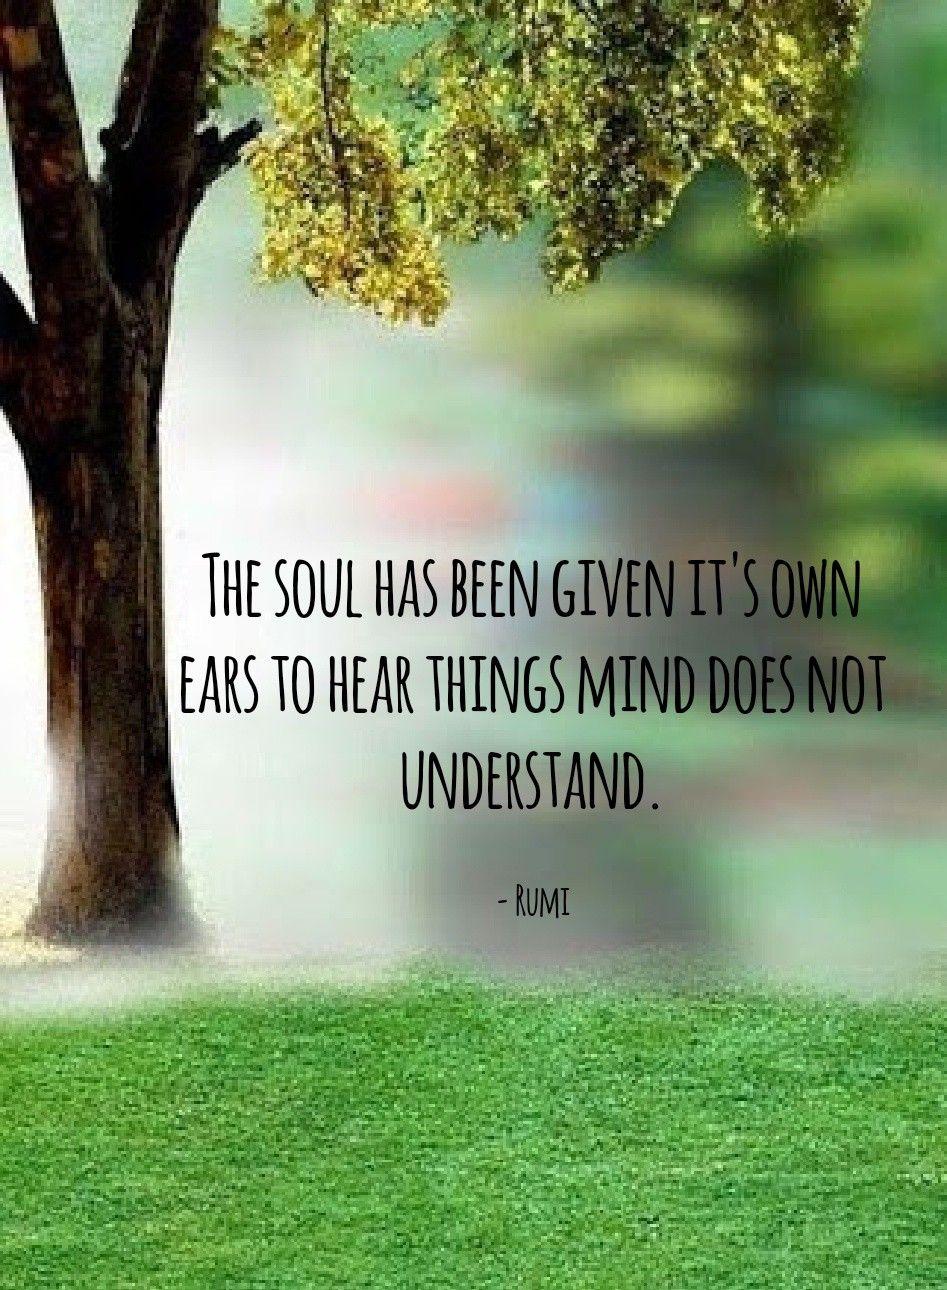 Spiritual Quotes About Life Journey Tumblr thumbnail